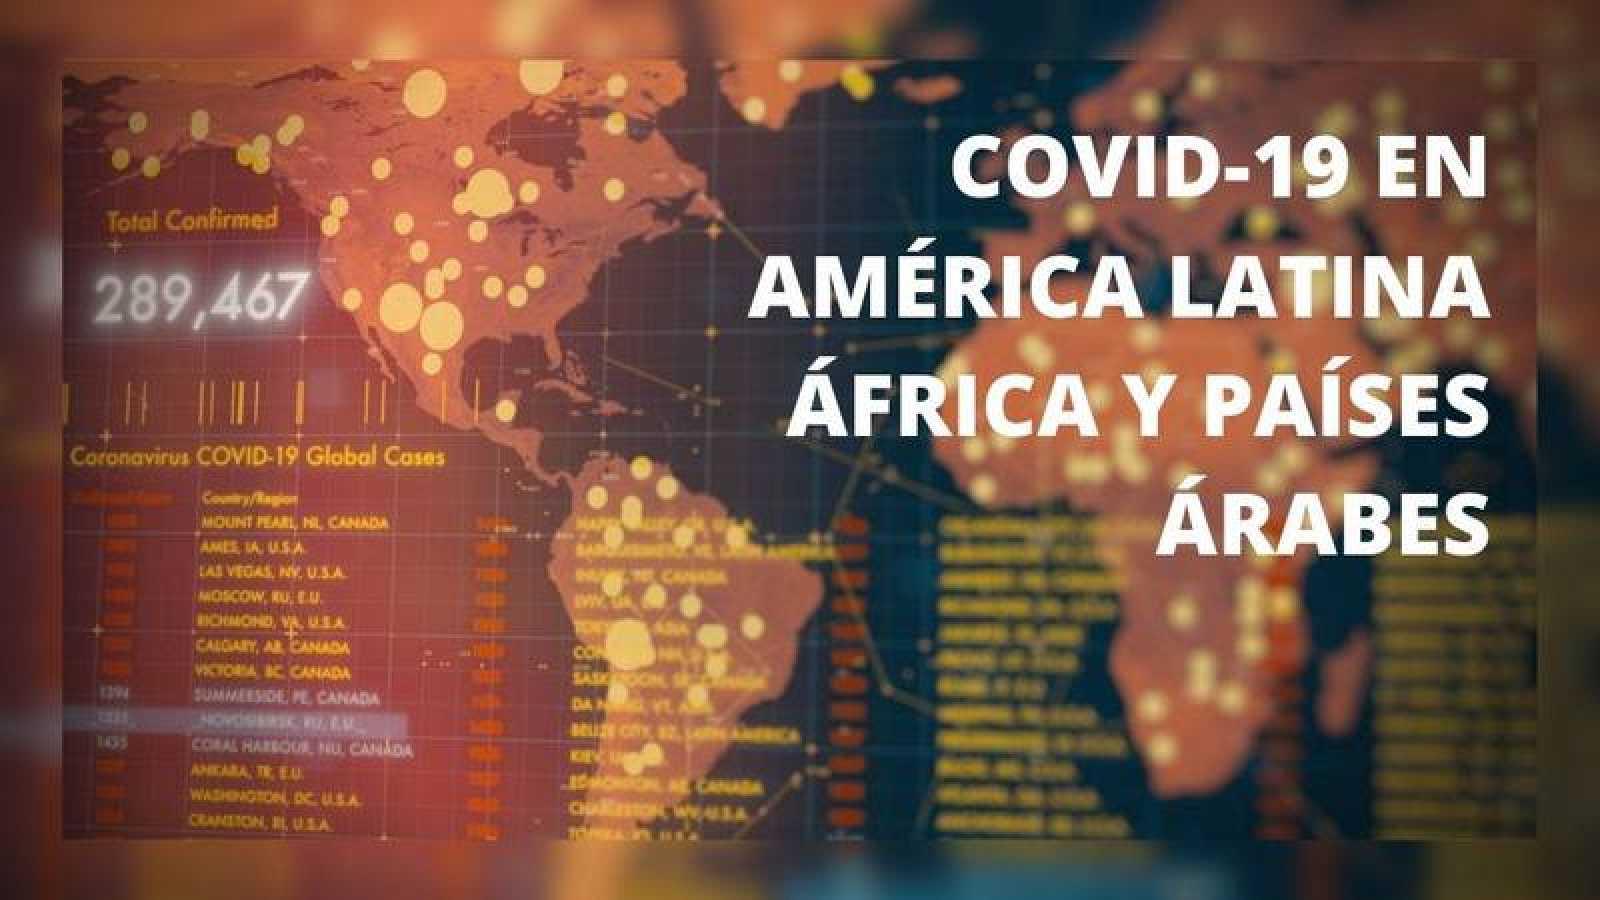 COVID-19 en América Latina, África y países árabes